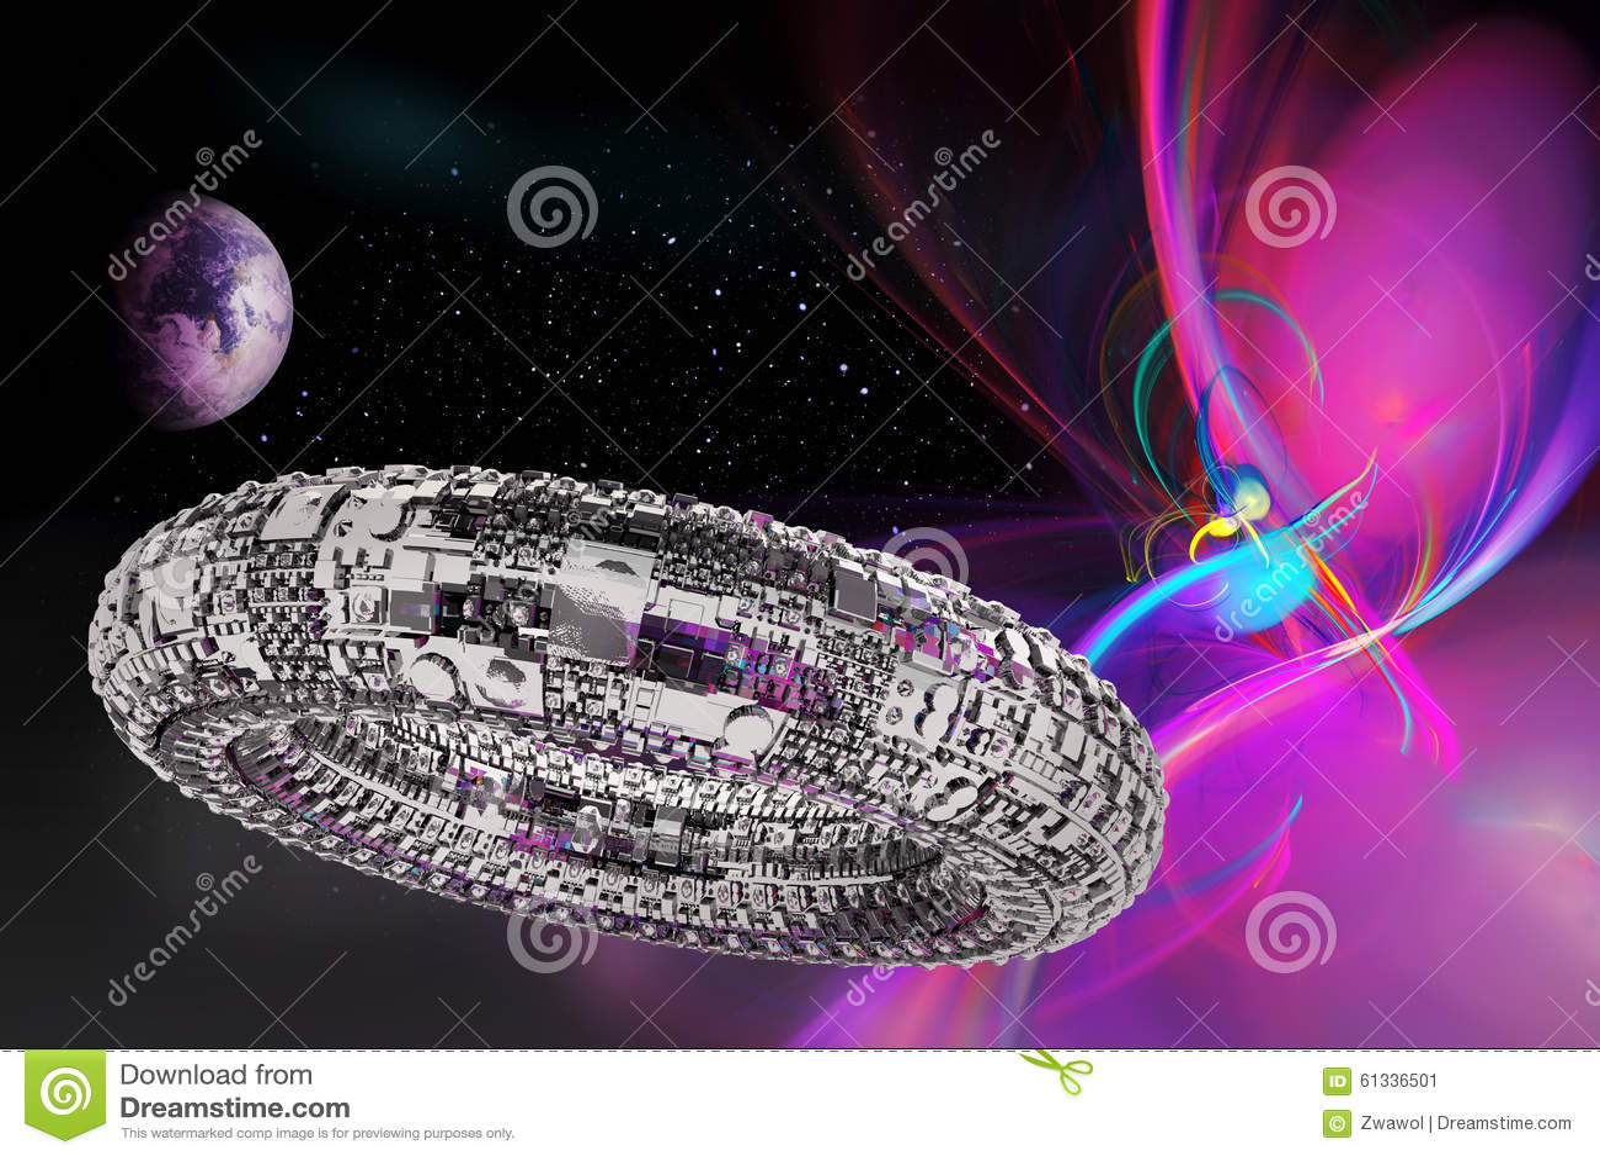 Fiktives Universum mit Raumschiff